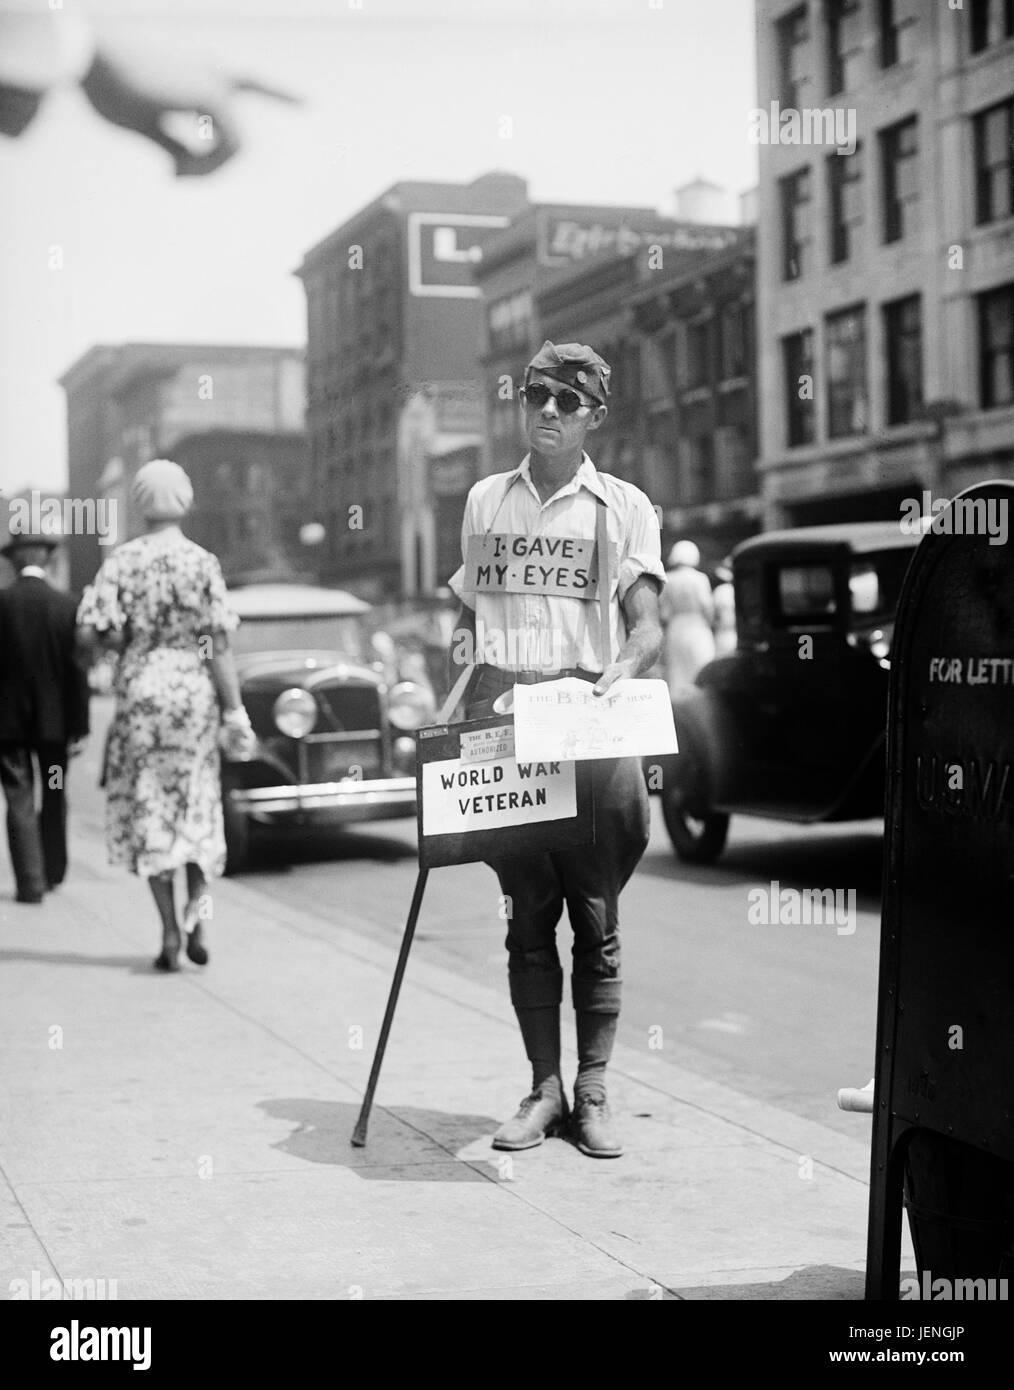 Blind World War I Veteran Selling Newspapers on Sidewalk, Washington DC, USA, 1933 - Stock Image